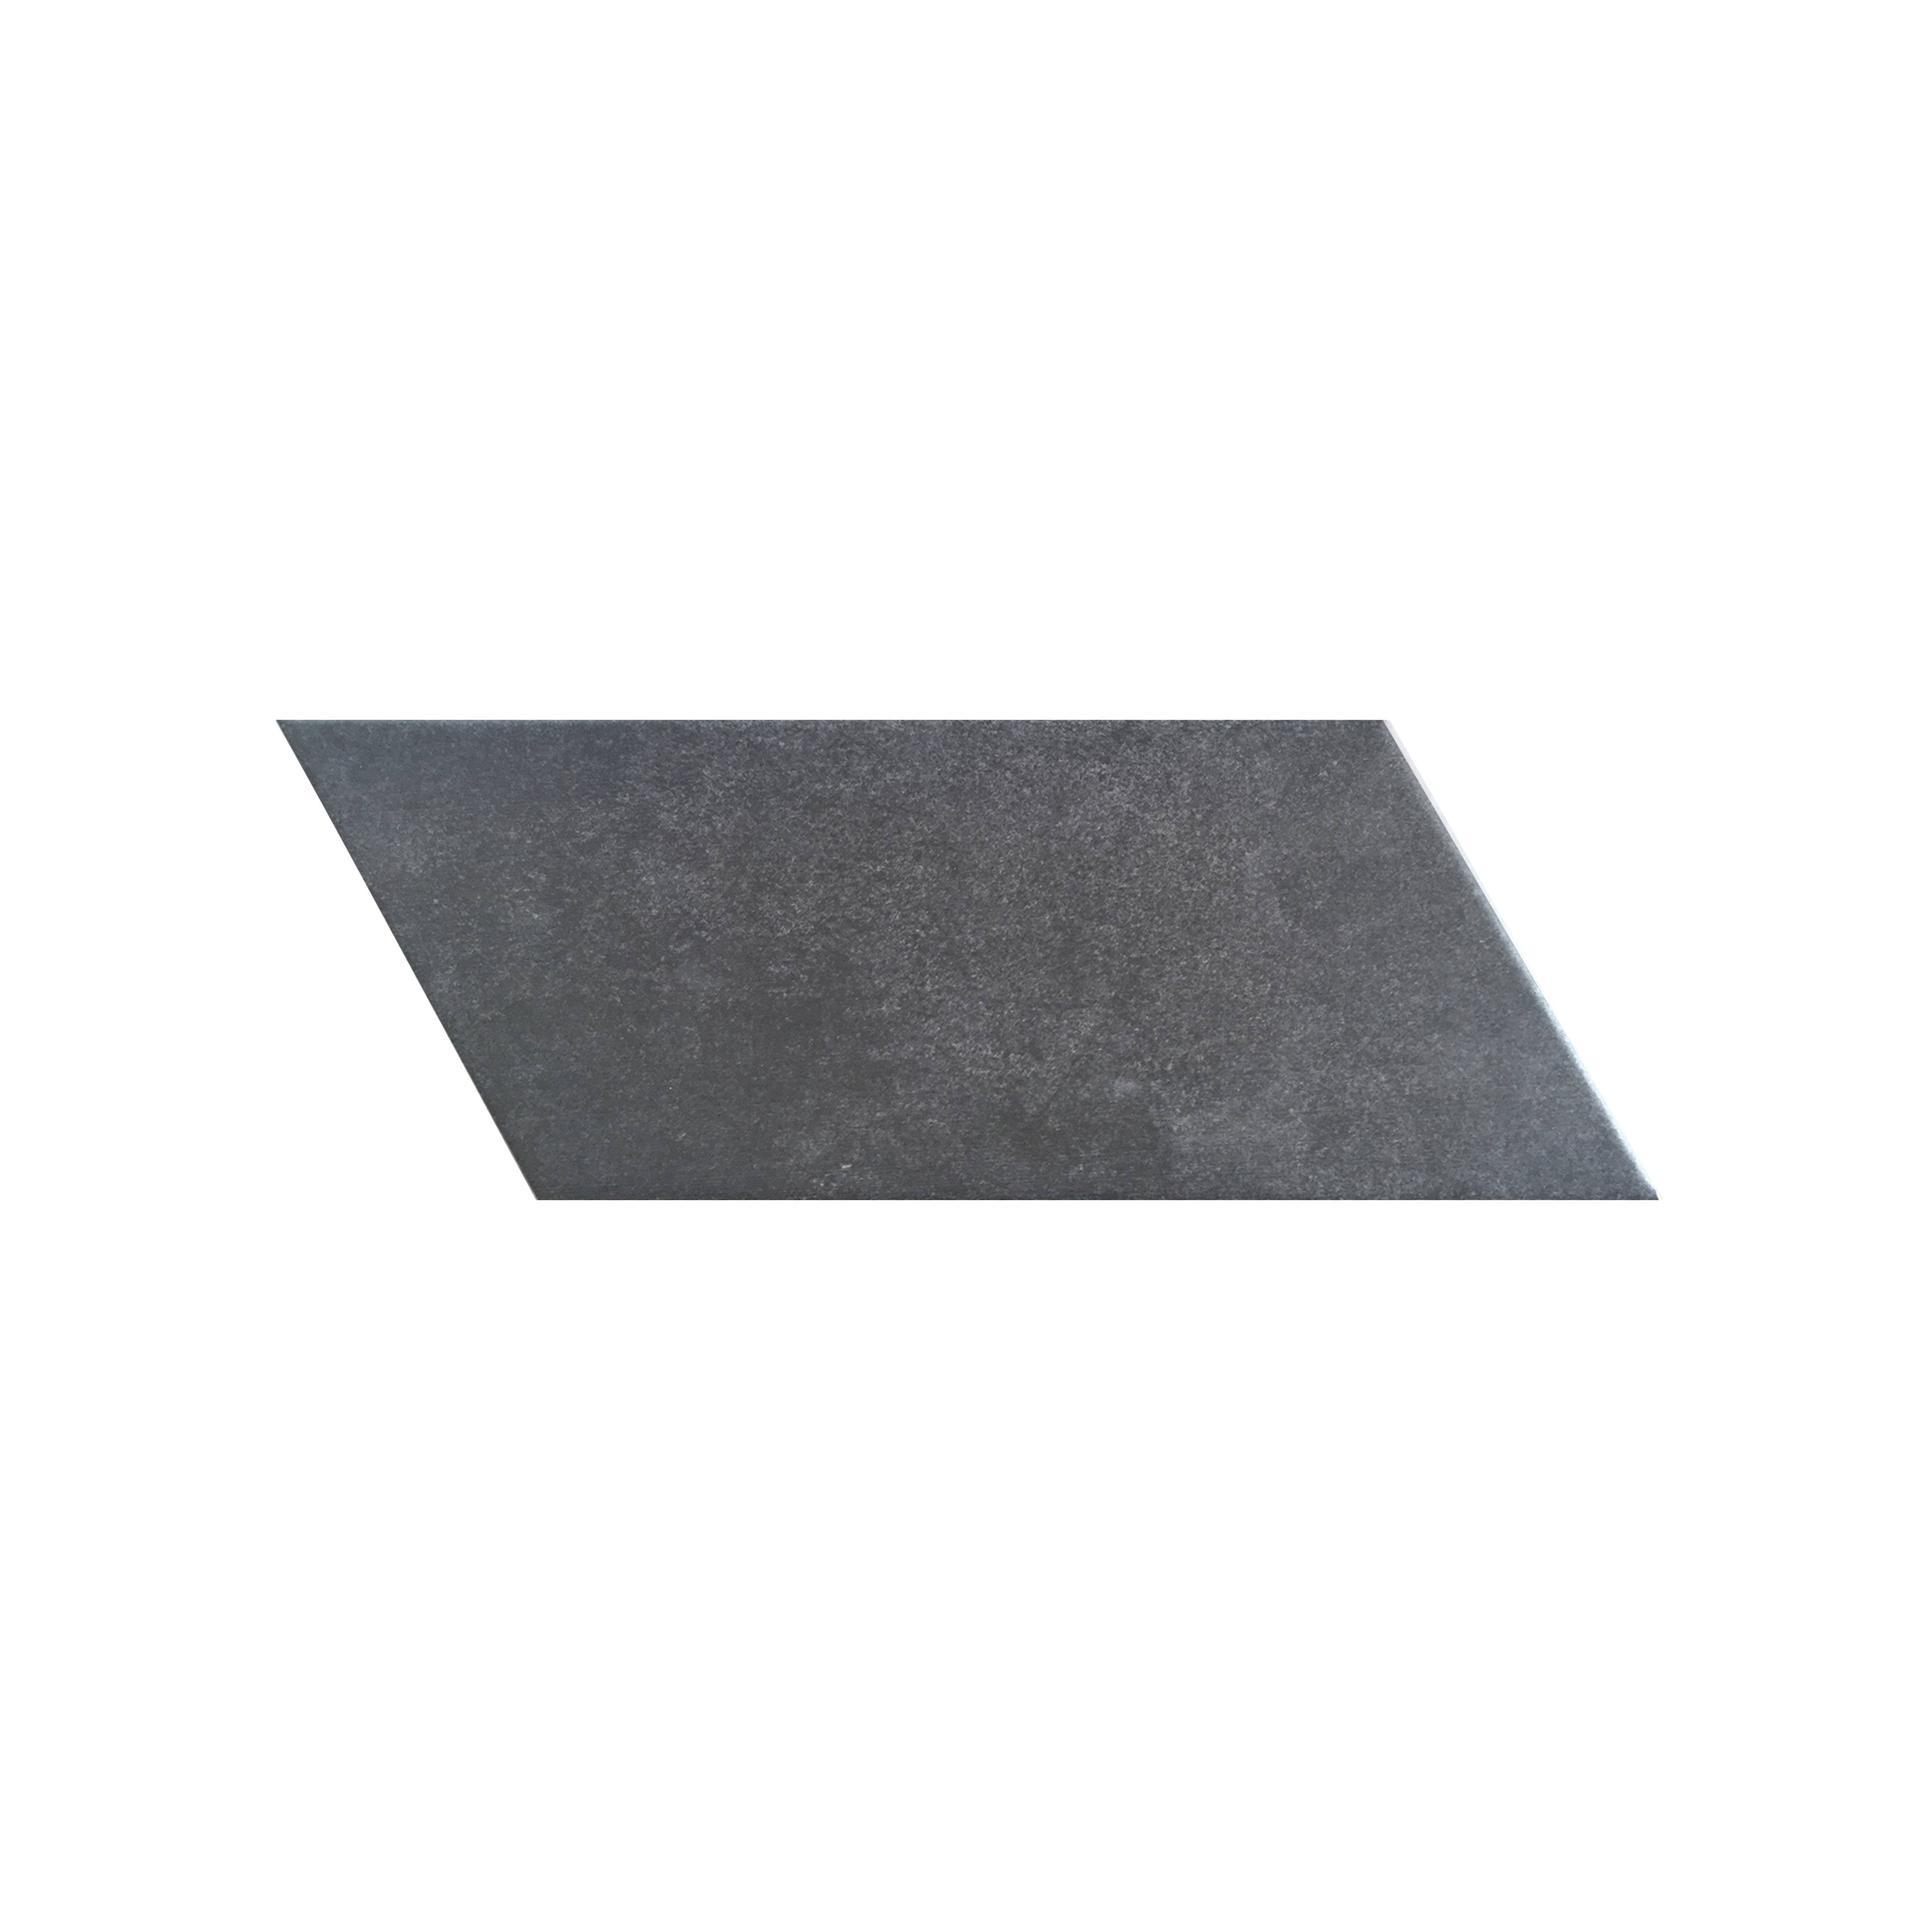 银灰岩HPYER13001S 深灰